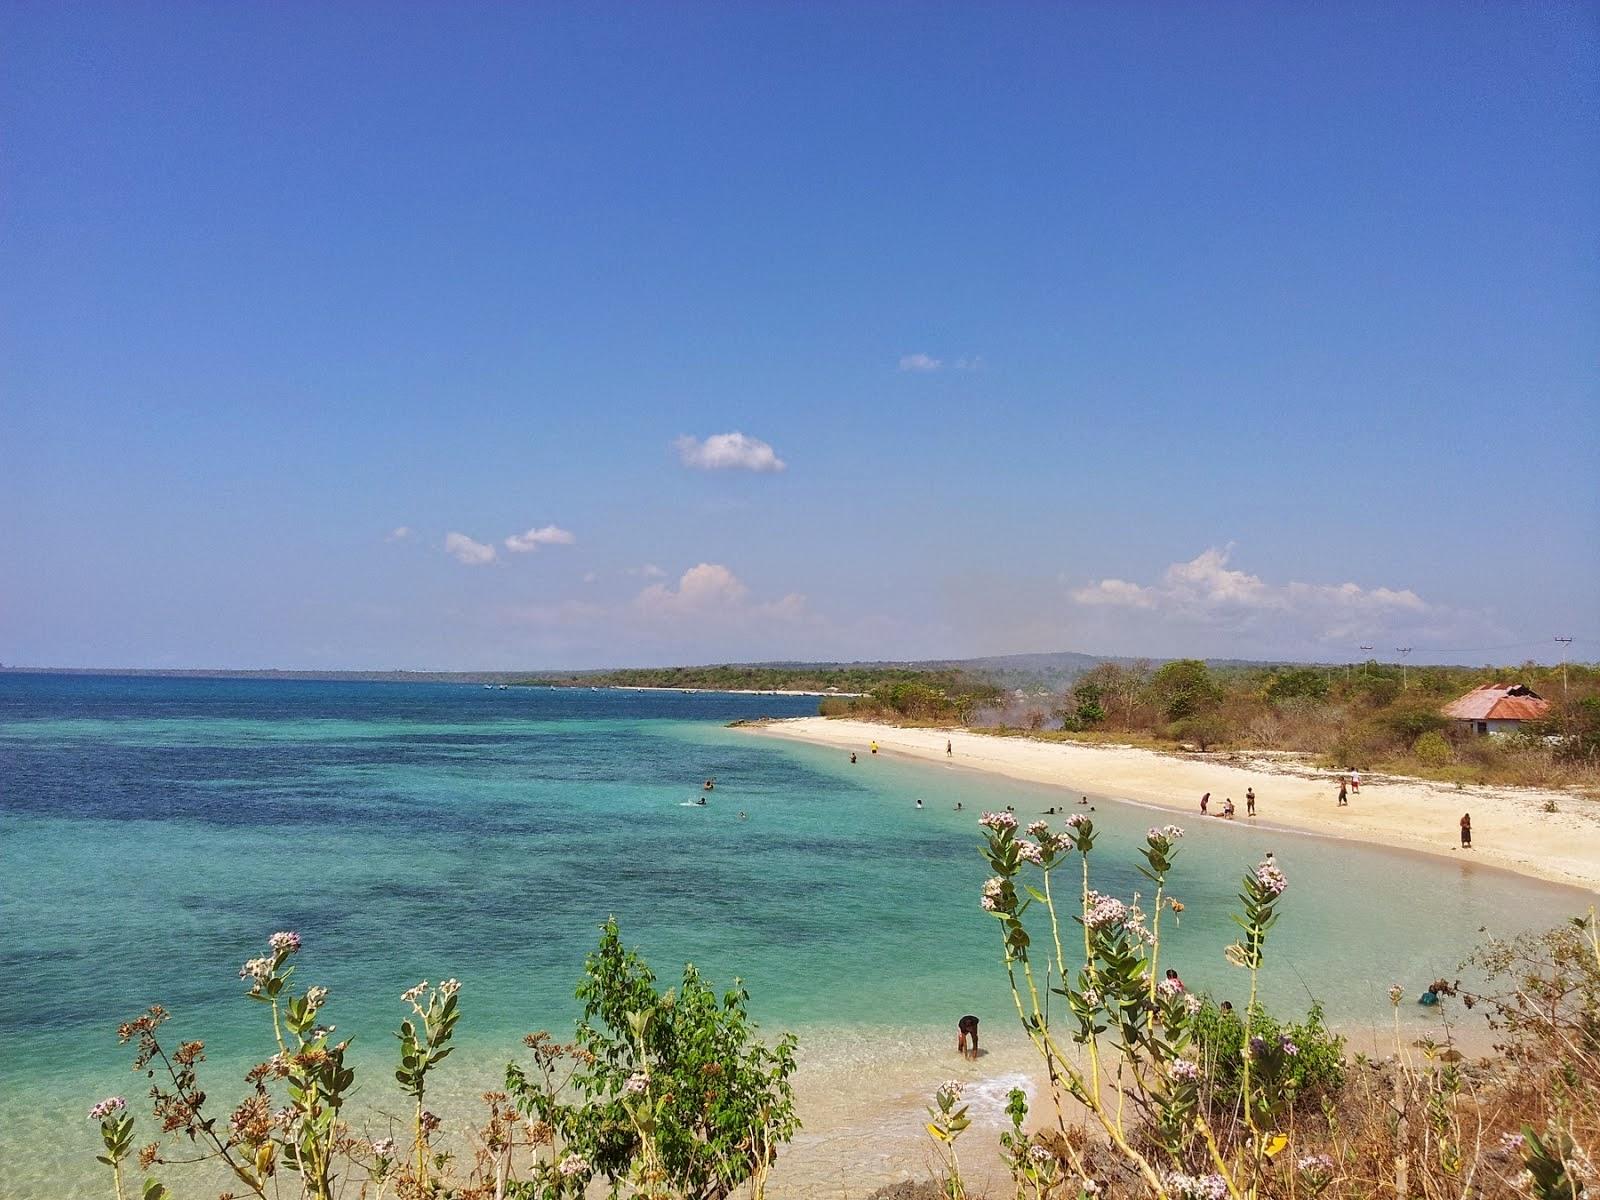 Indonesia Tamasya 5 Tempat Wisata Kupang Bisa Kunjungi Pantai Tablolong